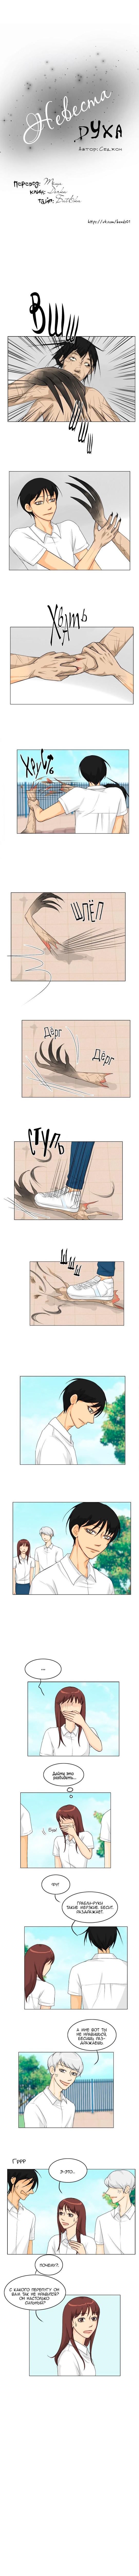 https://r1.ninemanga.com/comics/pic2/8/31048/426363/1535044455855.jpg Page 1